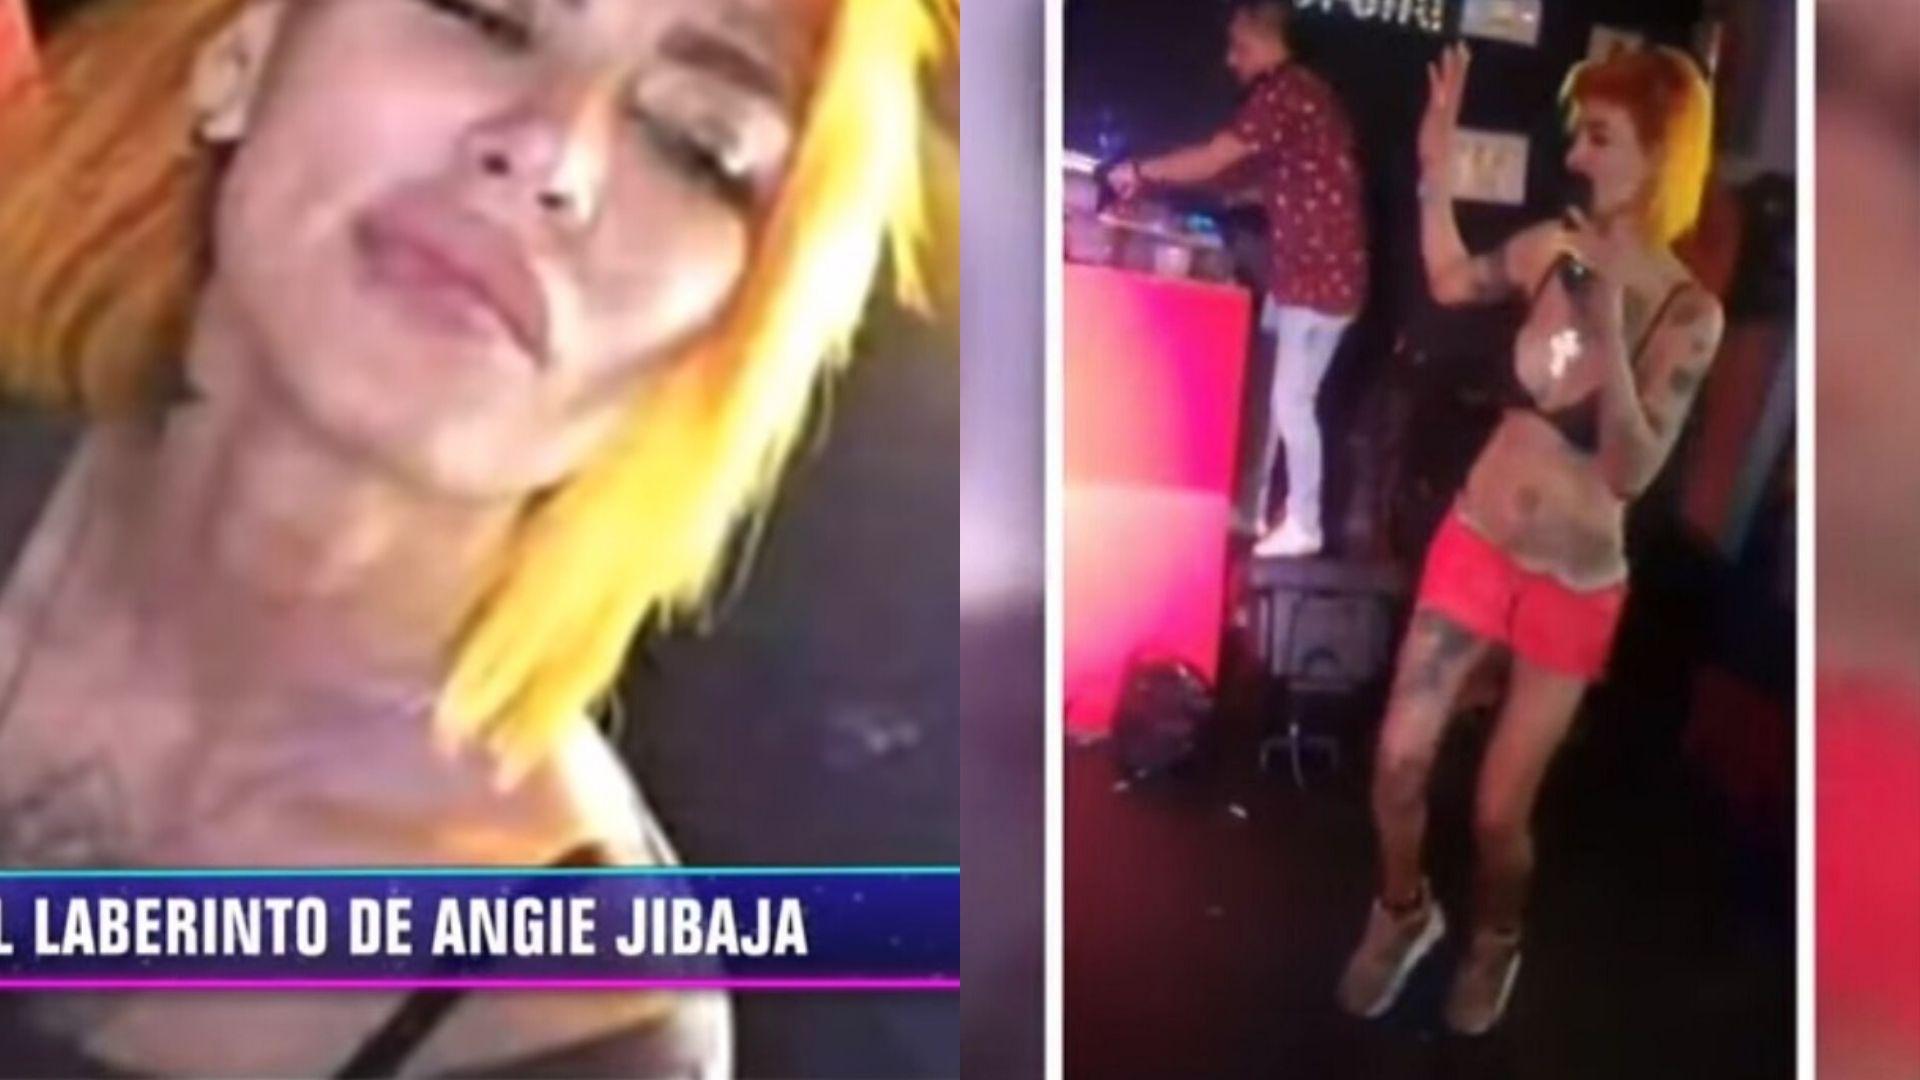 Angie Jibaja magaly medina muestra preocupantes imágenes de angie jibaja